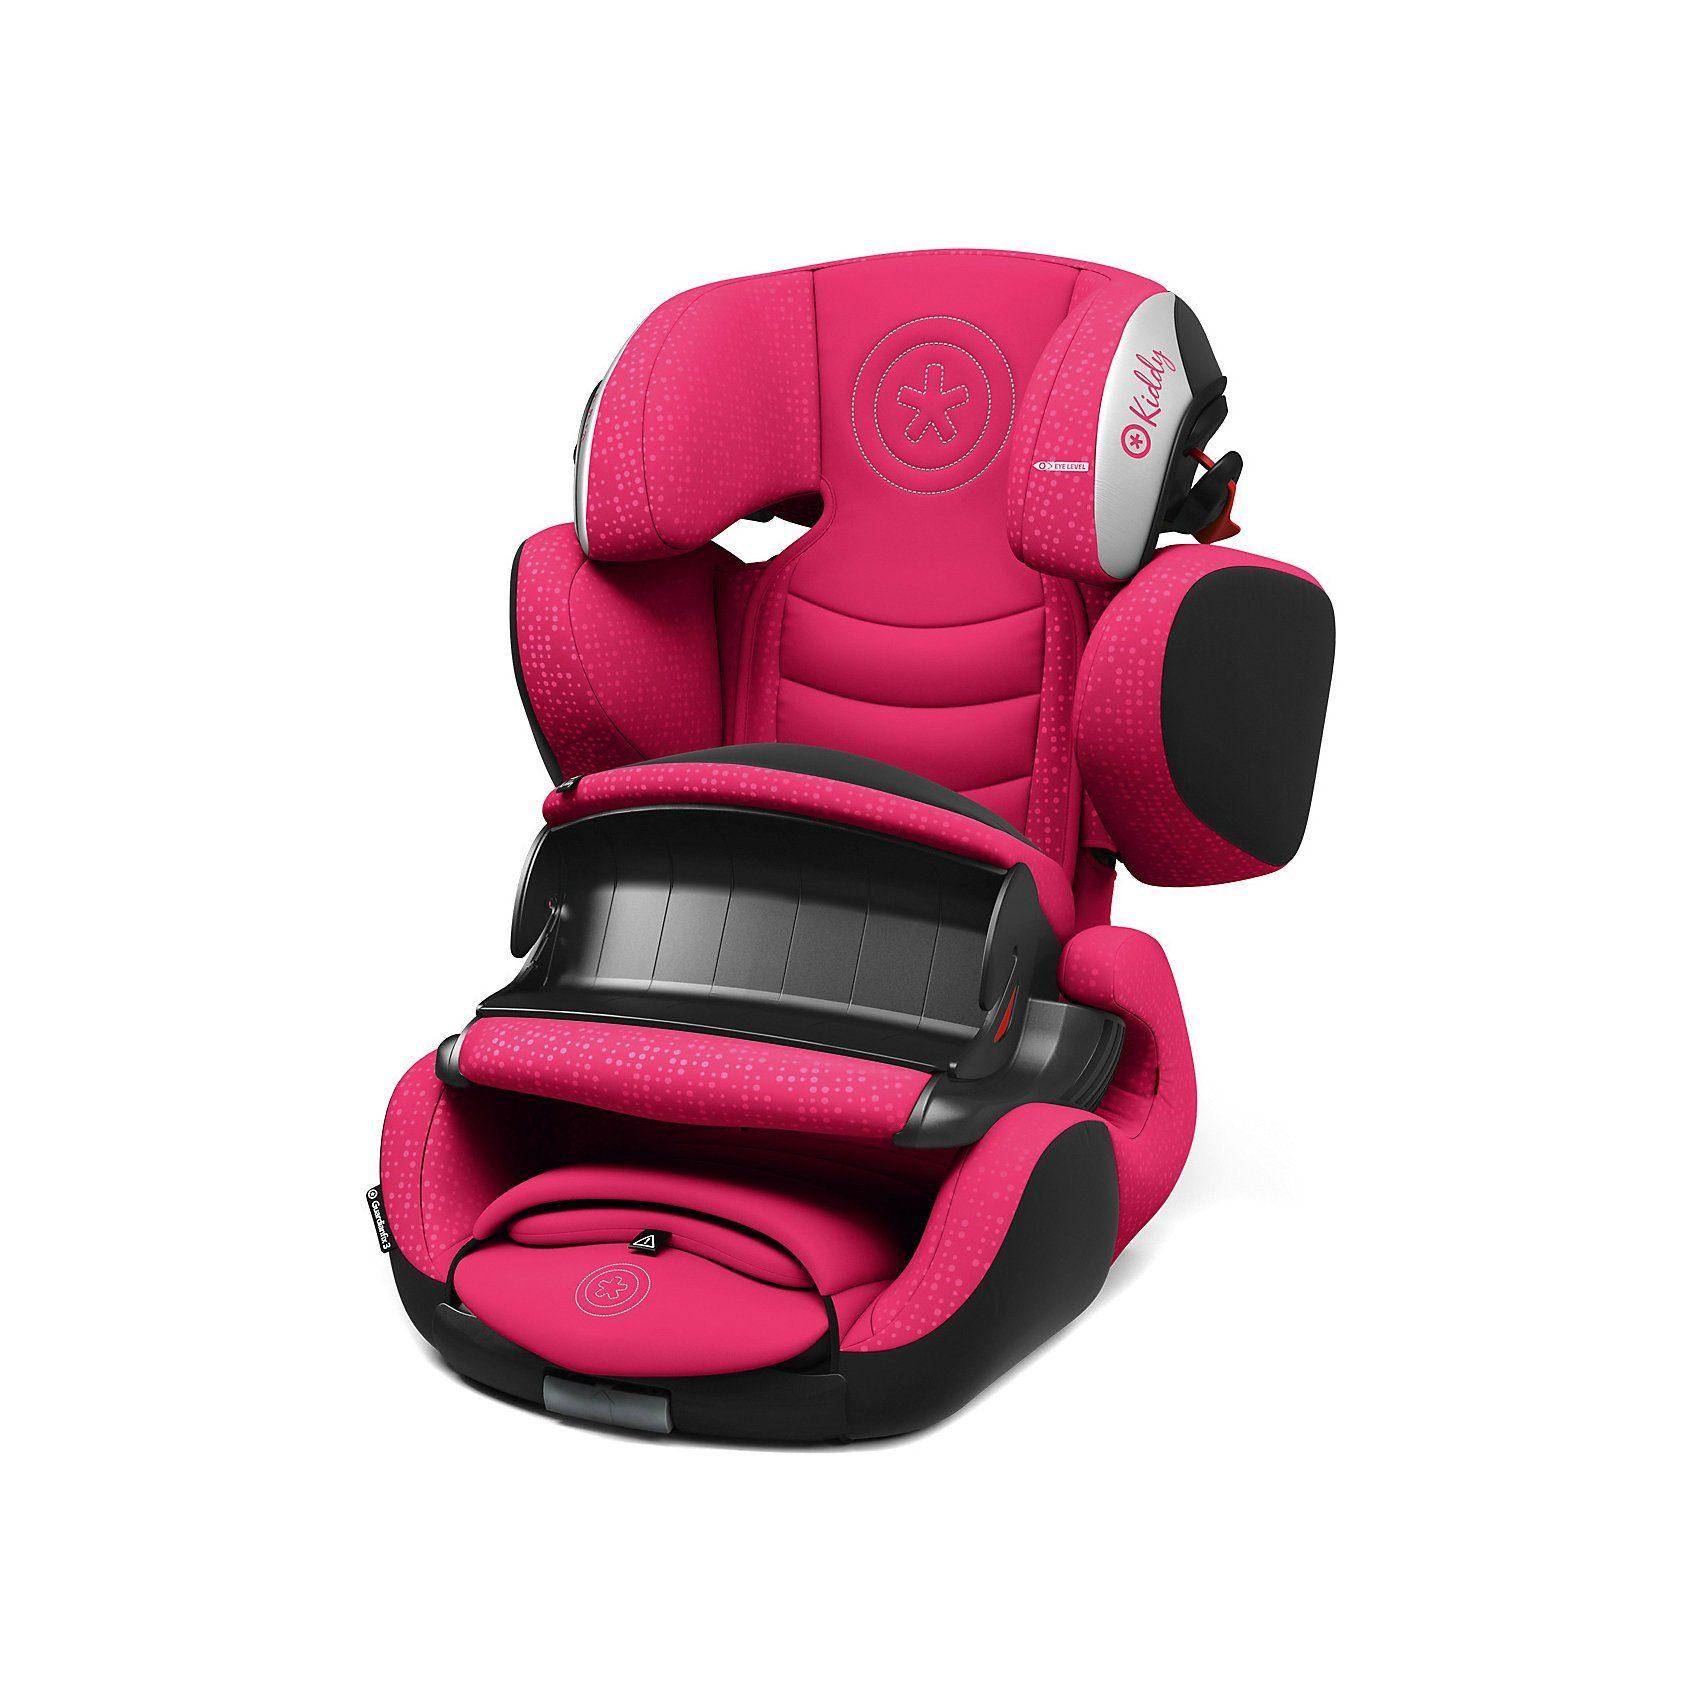 kiddy Auto-Kindersitz Guardianfix 3, Berry Pink, 2018